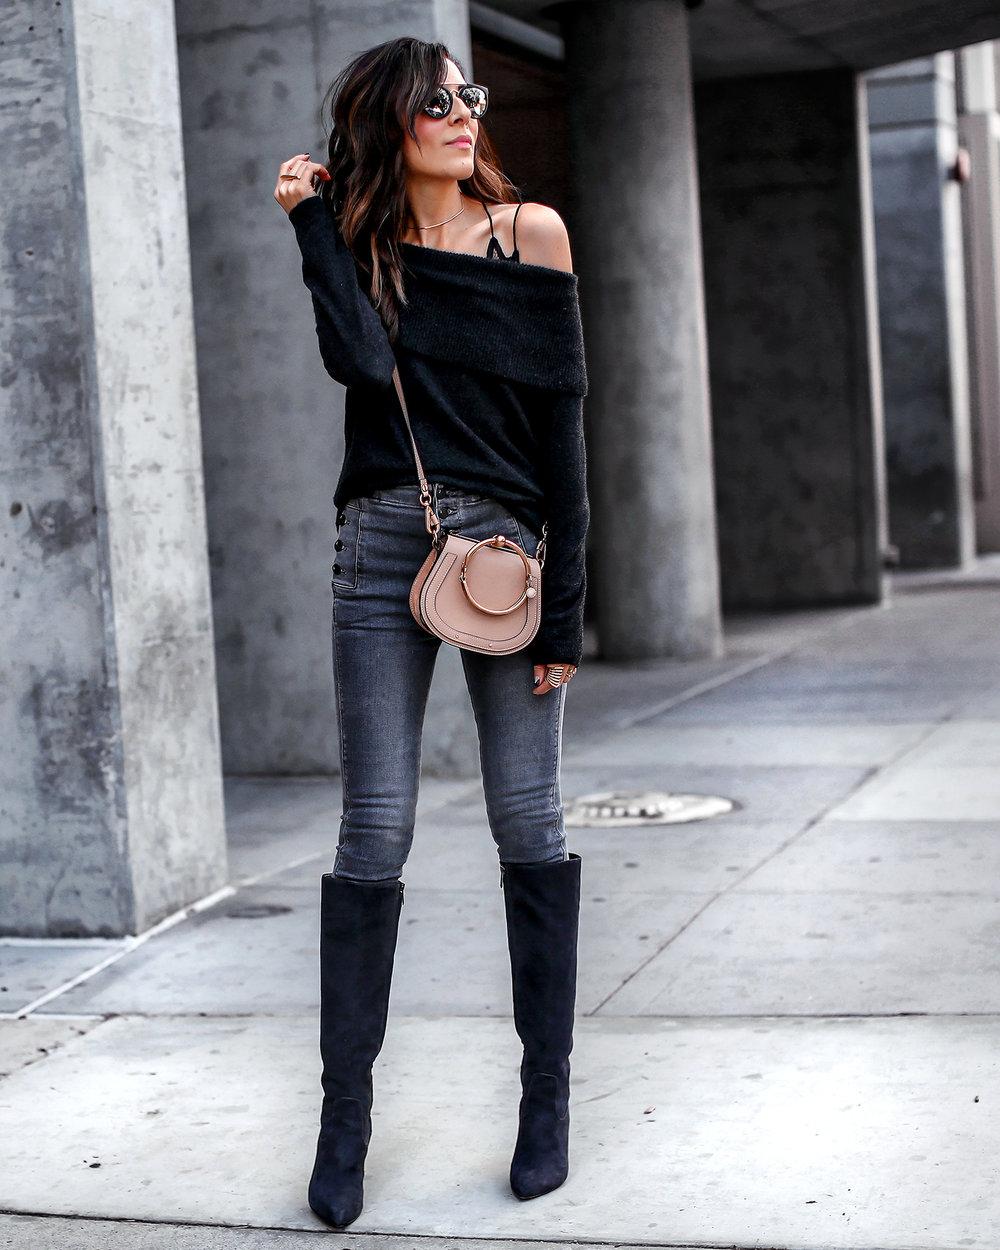 JBrand Jeans Joei Sweater Spring Fashion Sam Edelman Boots.jpg